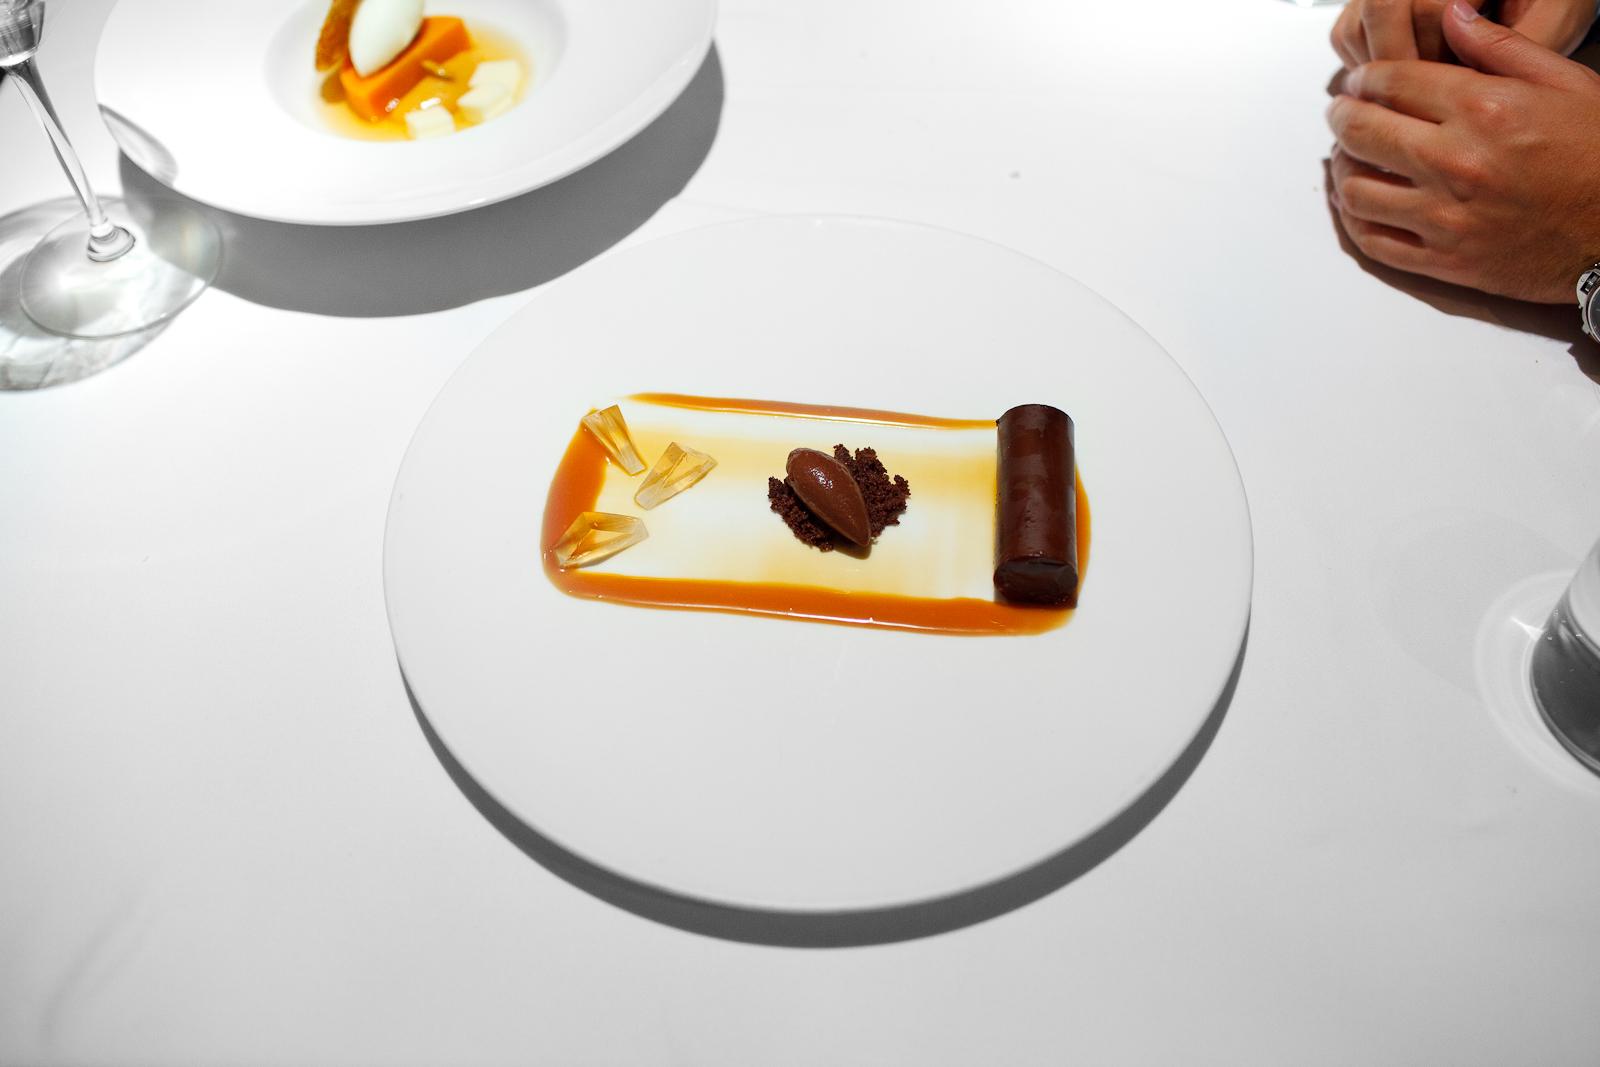 9th Course: Mousse de café de olla, salsa de caramelo, sorbet de chocolate (Cinnamon-coffee mousse, caramel, chocolate sorbet)